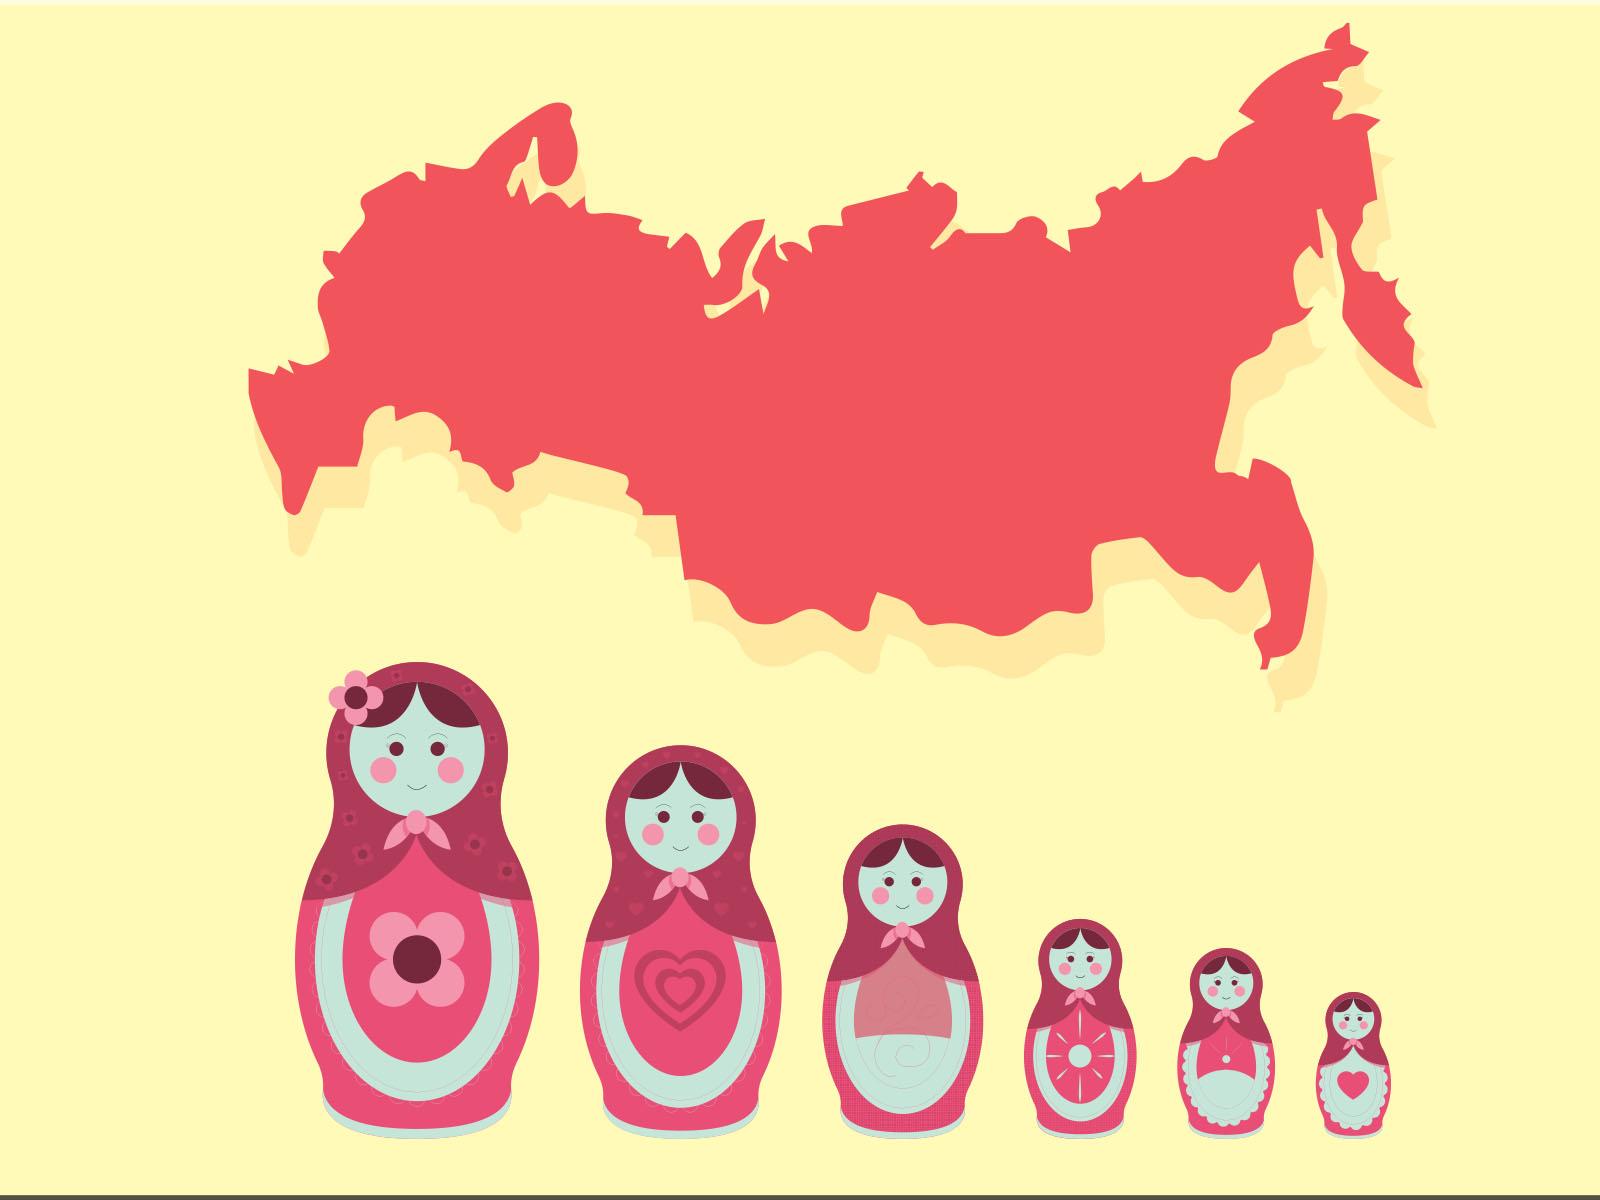 Matryoshka with russia map backgrounds for powerpoint templates matryoshka with russia map backgrounds for powerpoint templates ppt backgrounds toneelgroepblik Choice Image